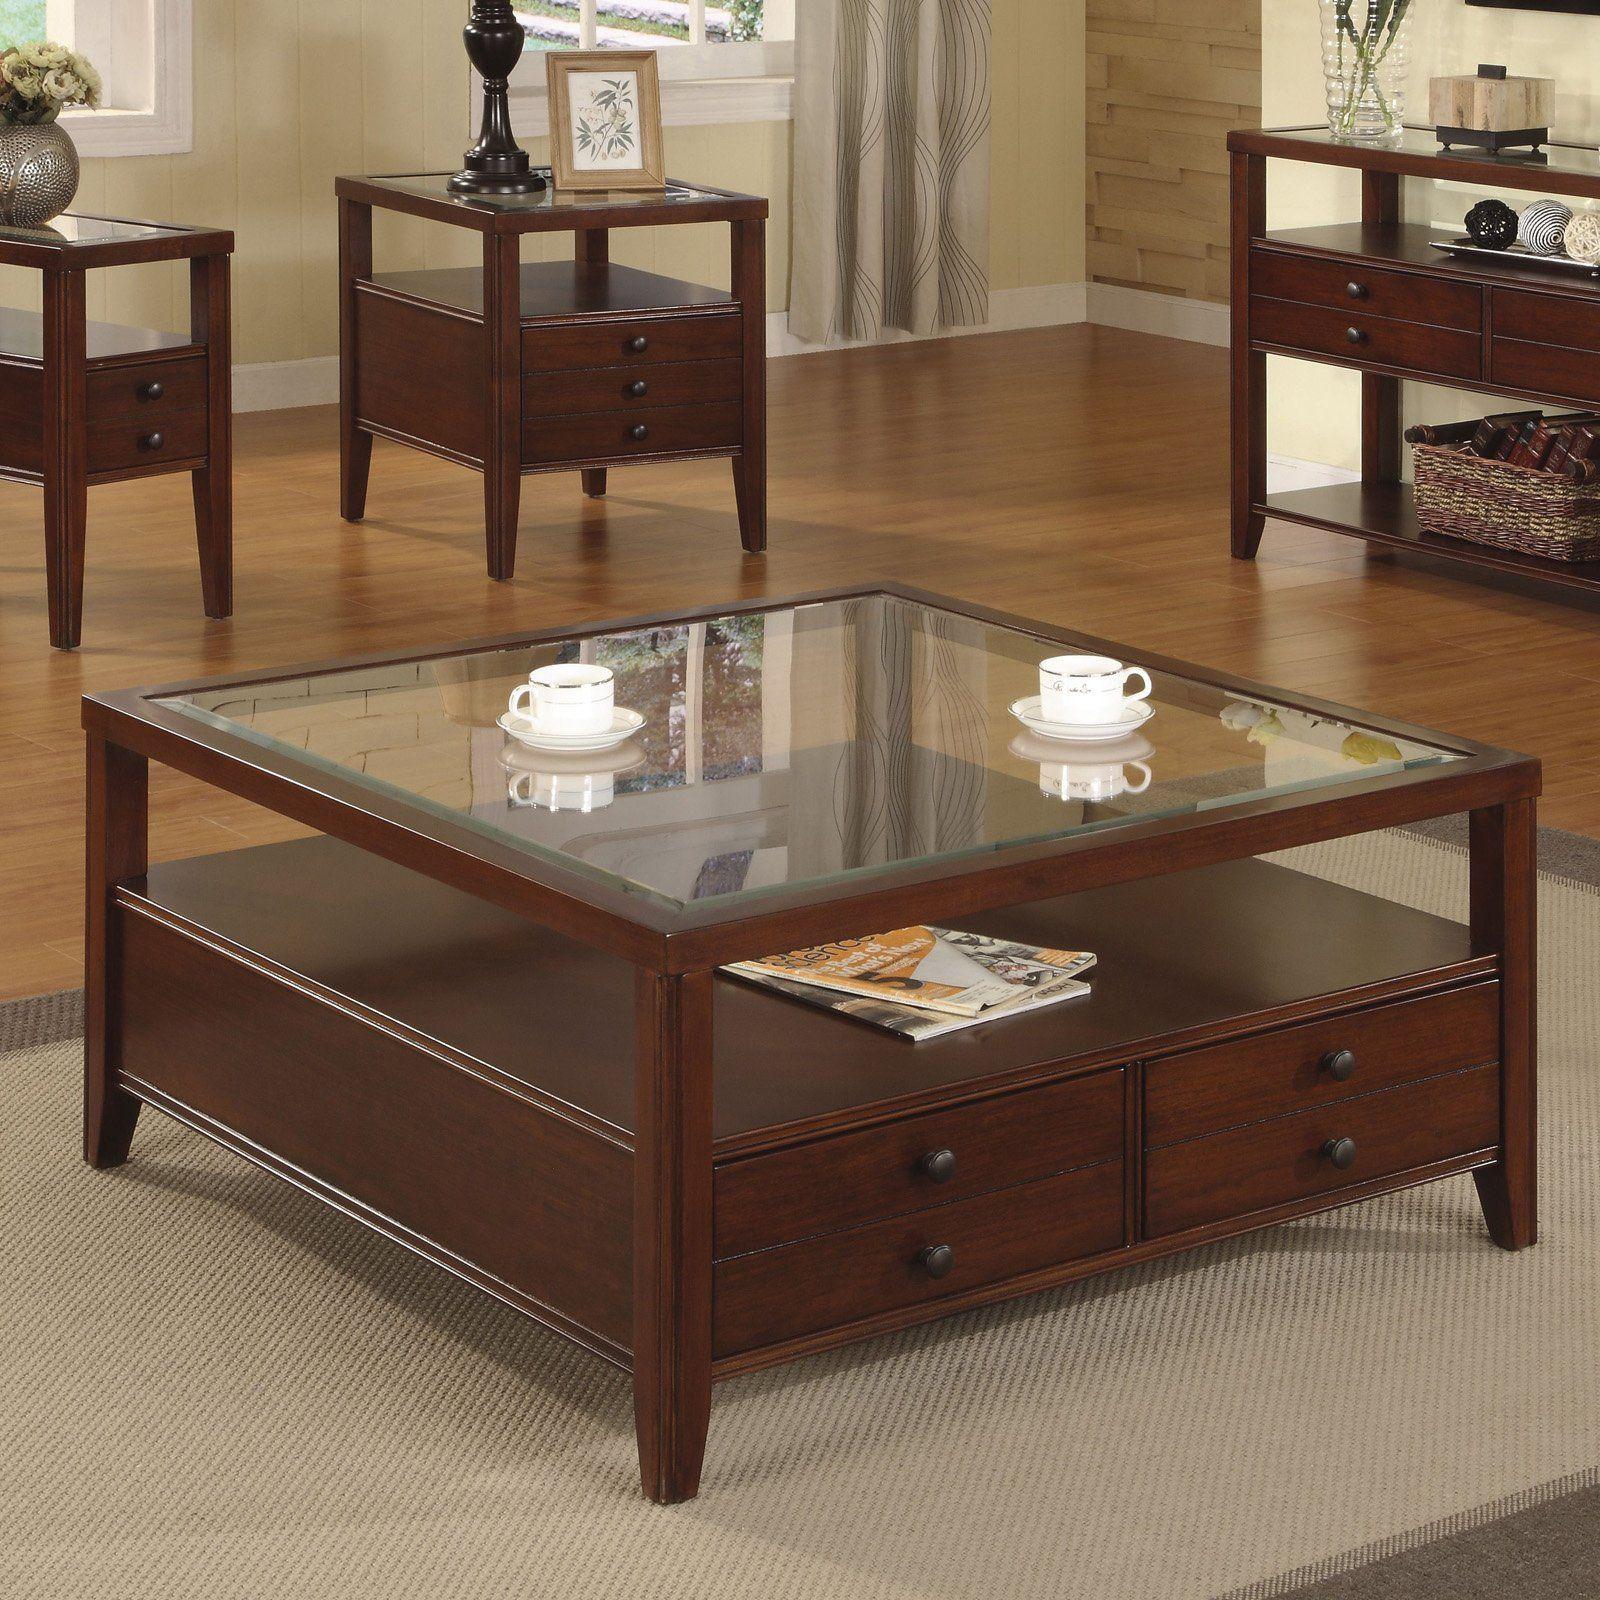 Riverside Avenue Square Coffee Table Set Www Hayneedle Com Coffee Table Coffee Table Square Coffee Table Furniture [ 1600 x 1600 Pixel ]